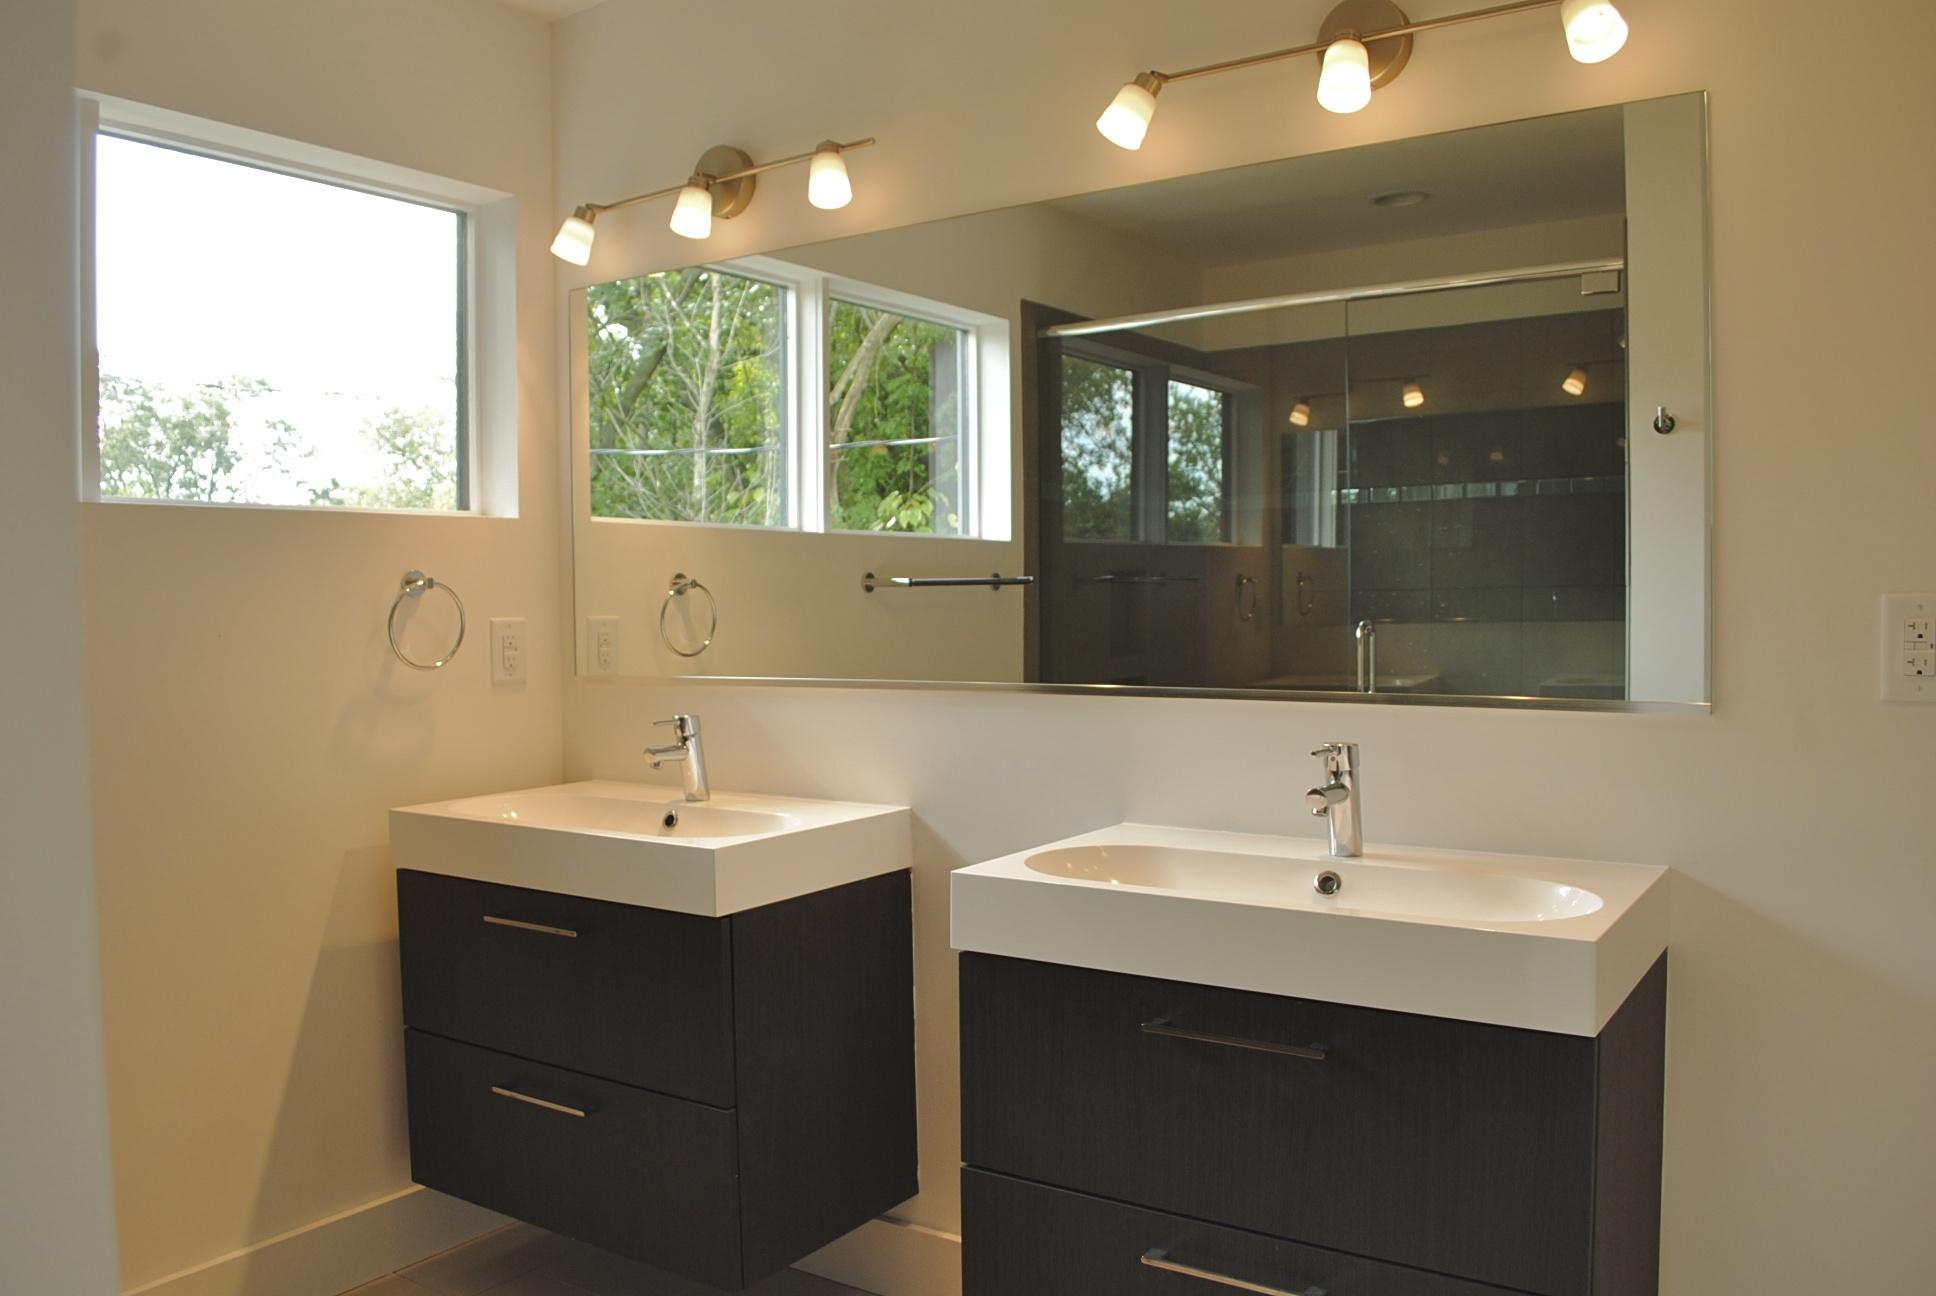 Bathroom Vanity Mirror Size